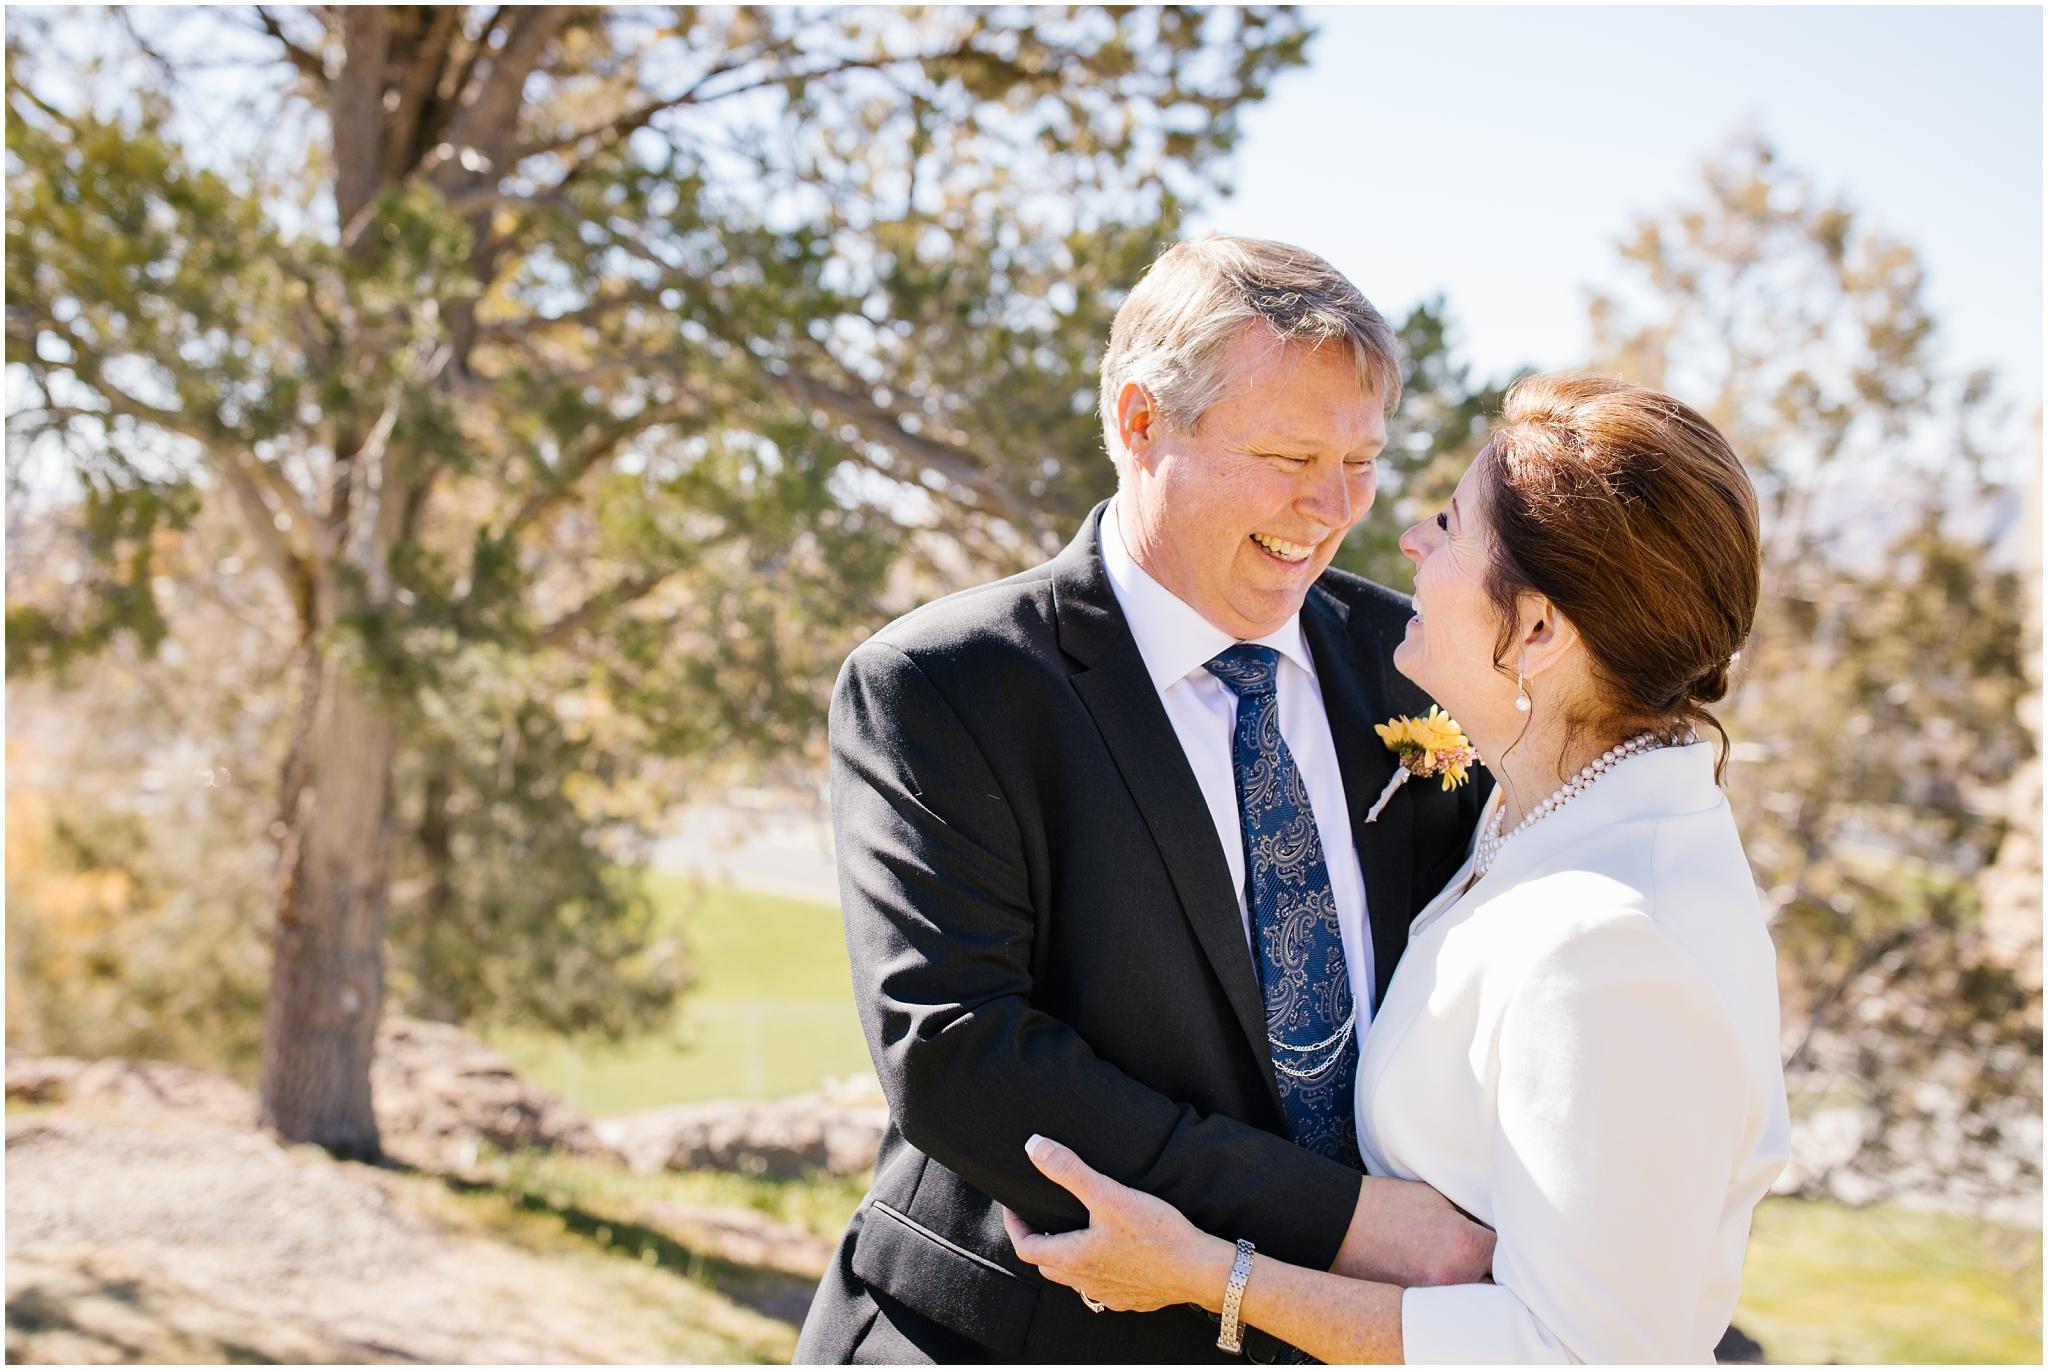 PDWeddingDay-93_Lizzie-B-Imagery-Utah-Wedding-Photographer-Salt-Lake-City-Park-City-Utah-County-Manti-Temple.jpg